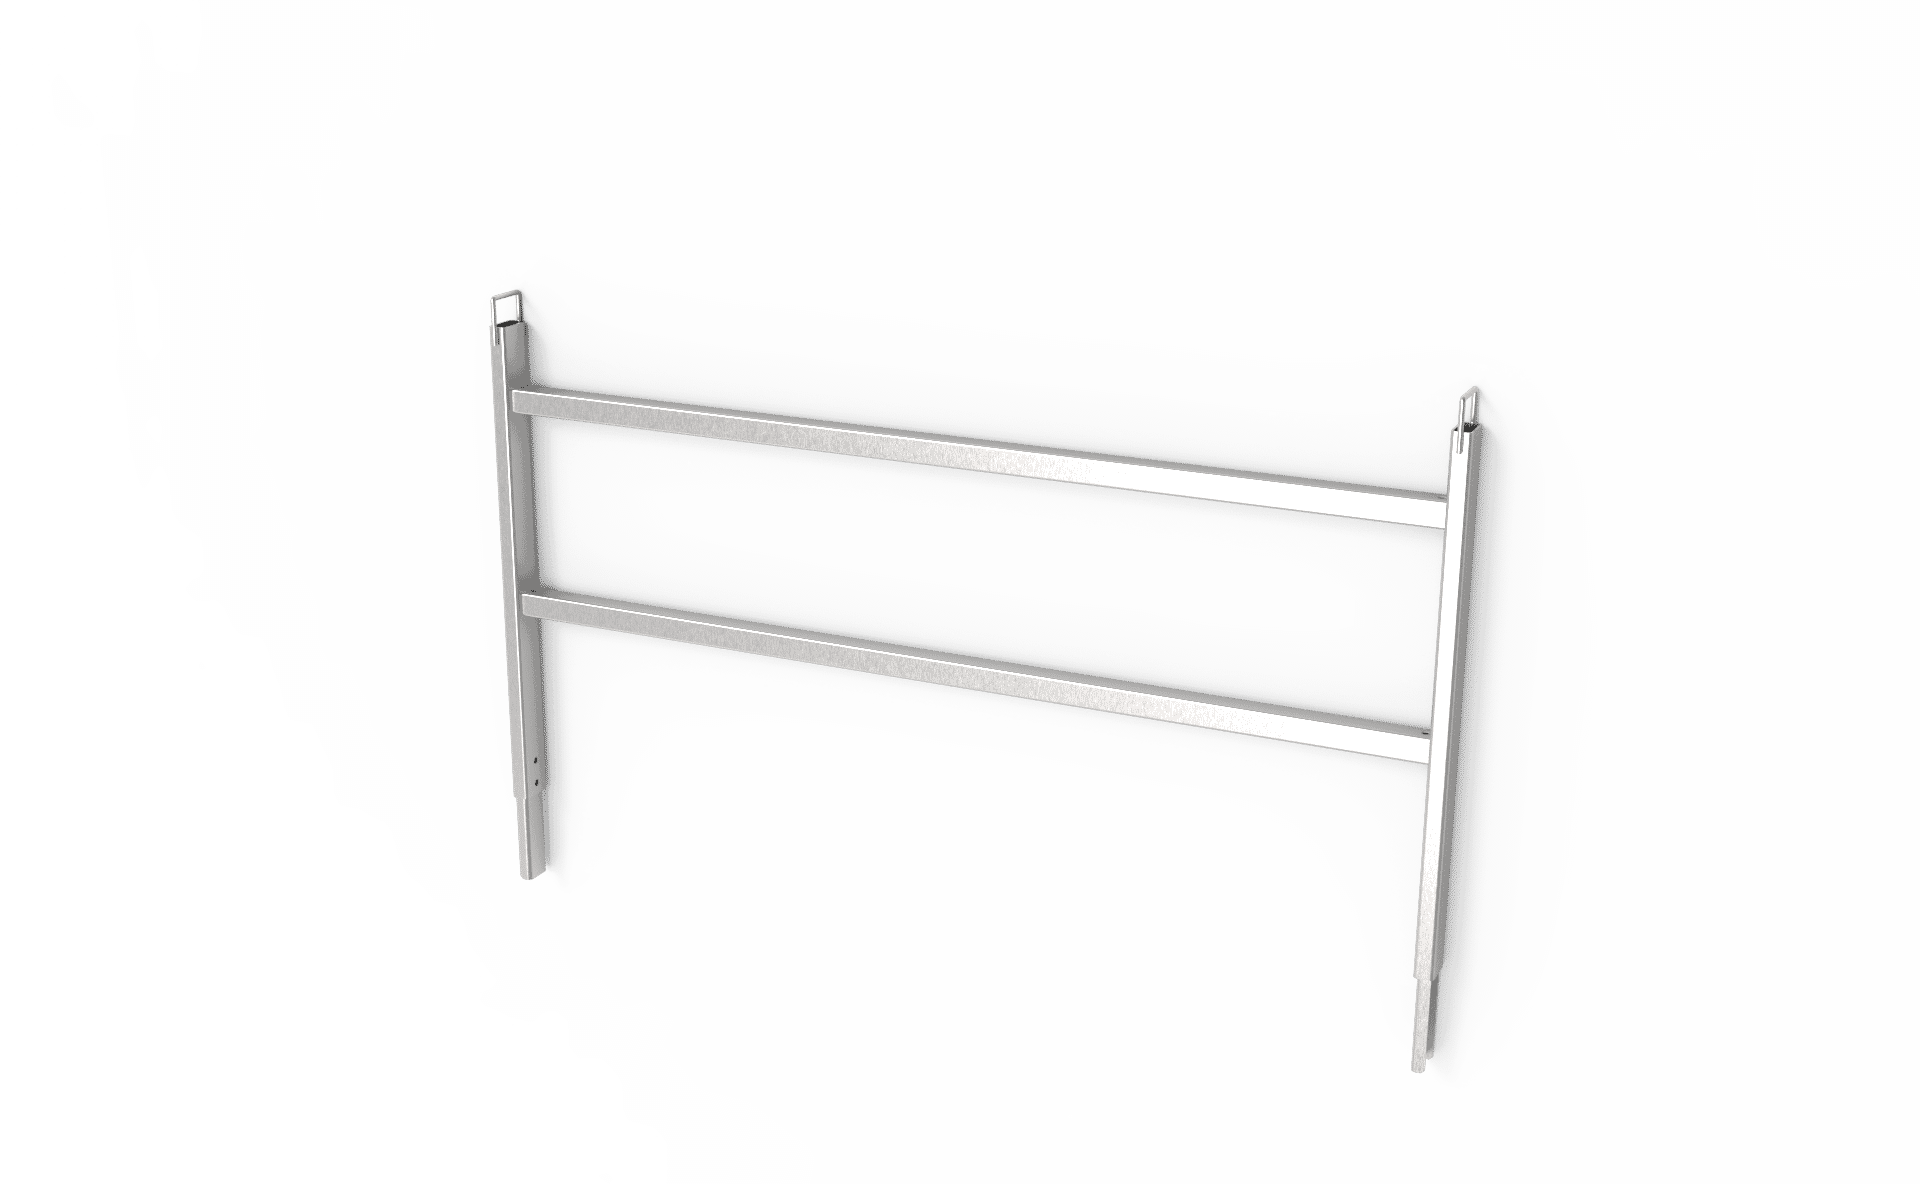 H-Gestell 800 mm